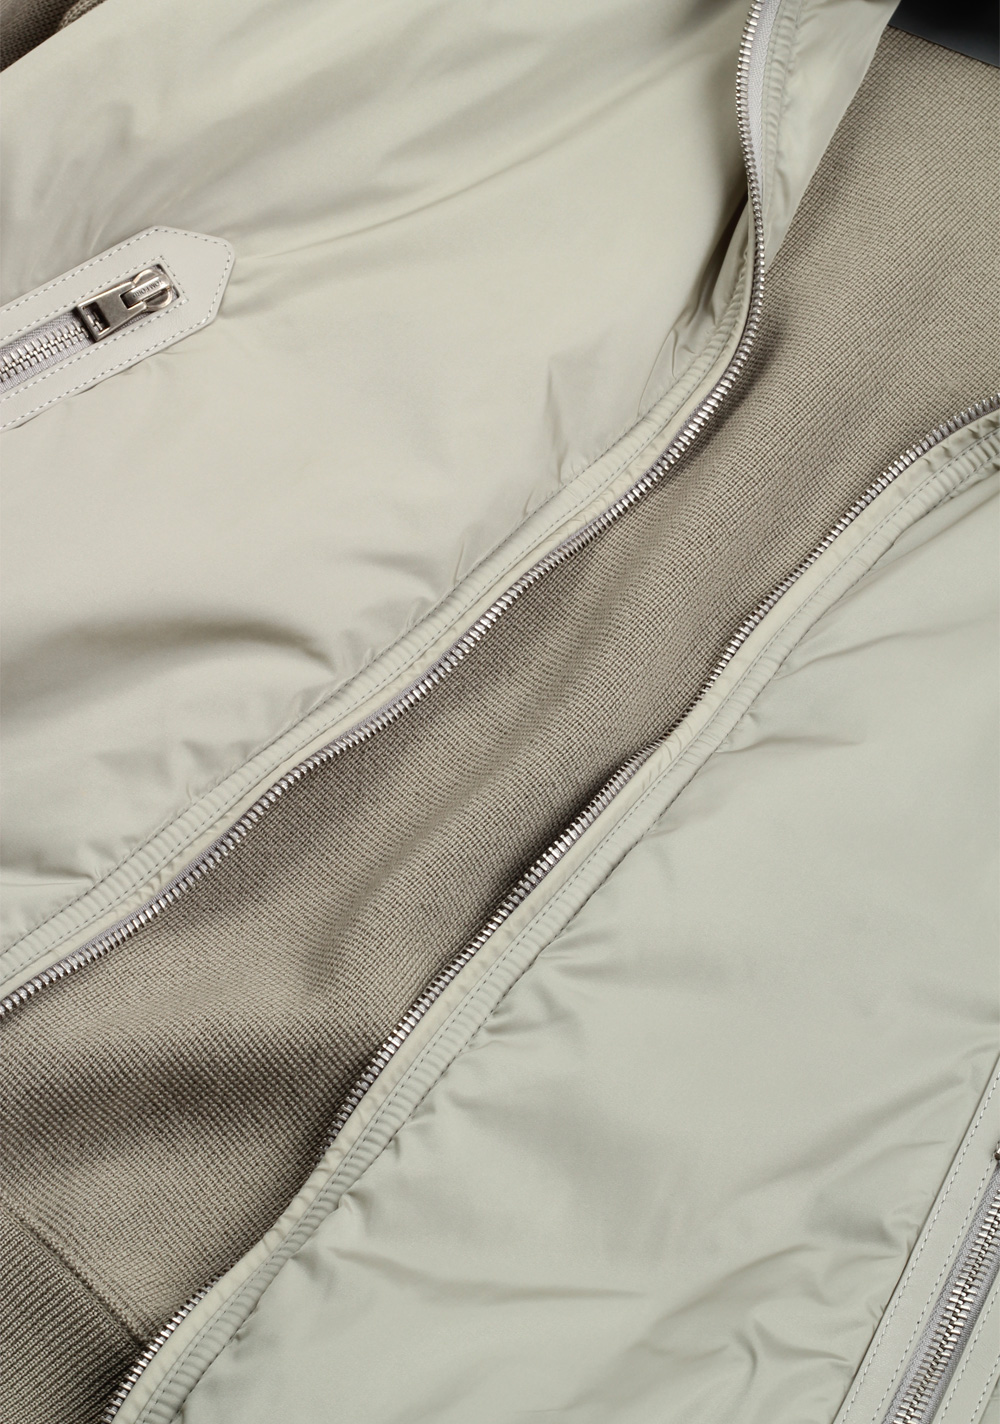 TOM FORD Beige 2020 James Bond Spectre Bomber Jacket | Costume Limité